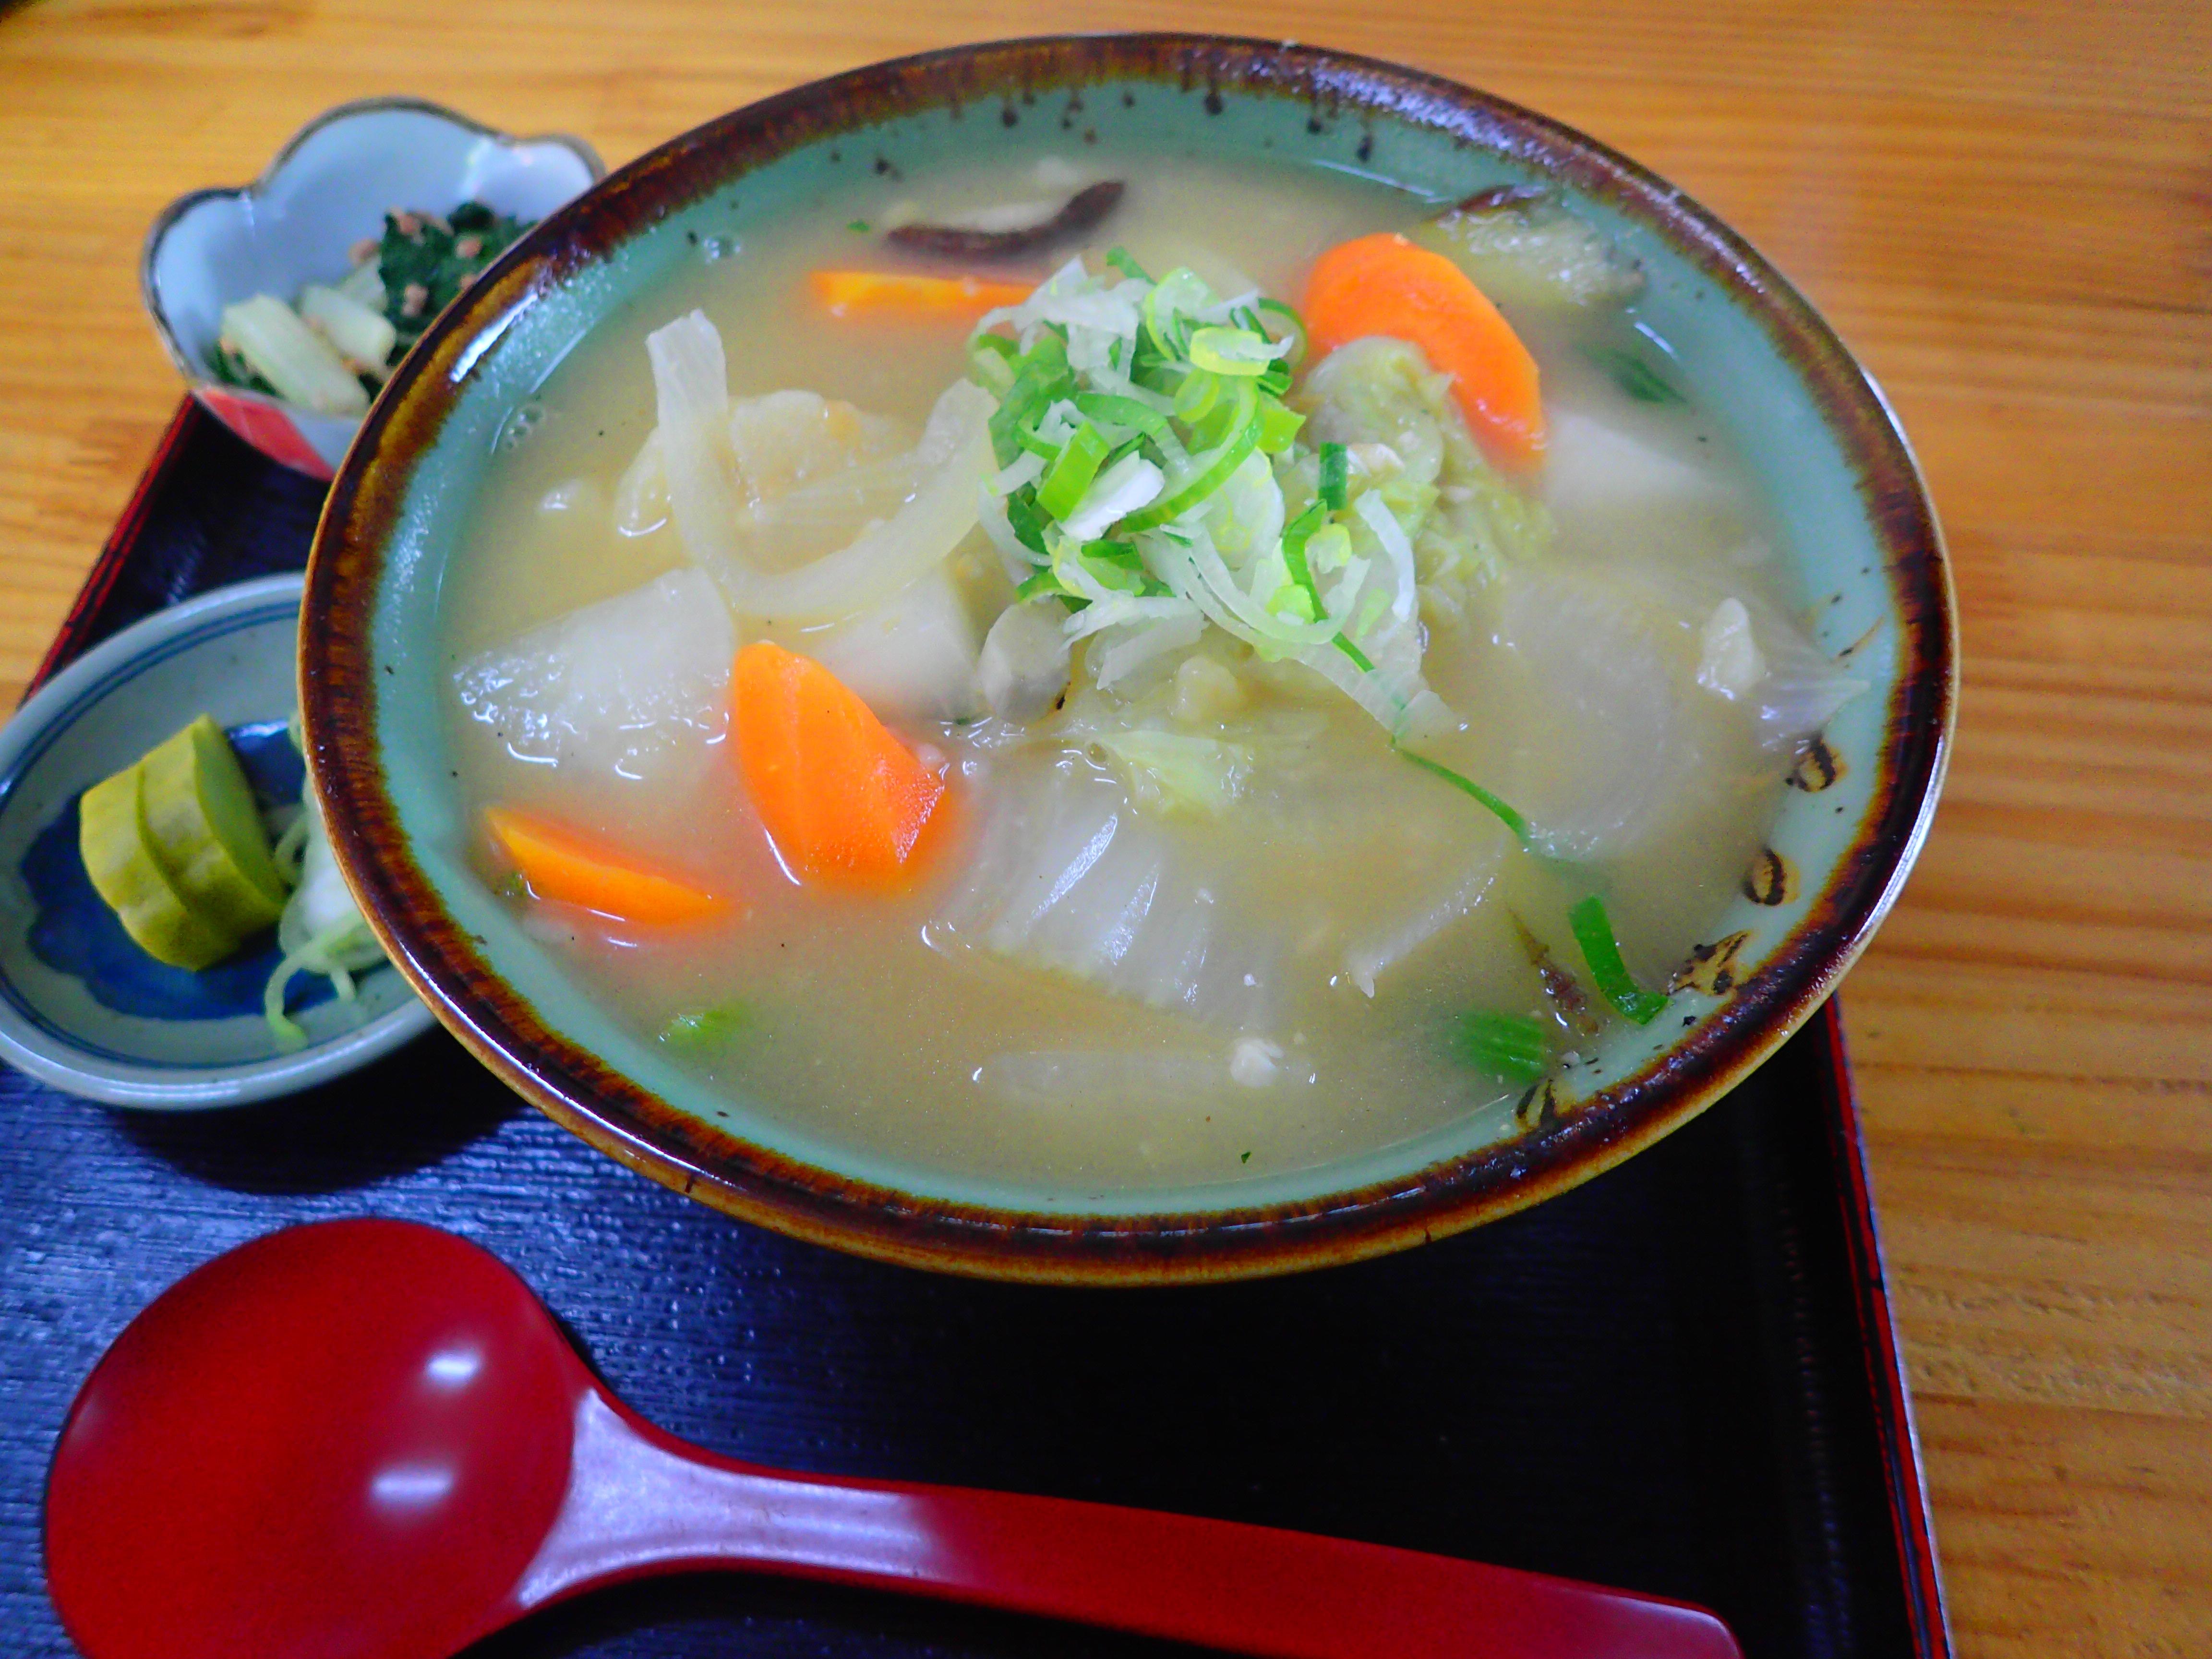 http://www.yamanashi-kankou.jp/blog/5G5fM9_PB010638.jpg